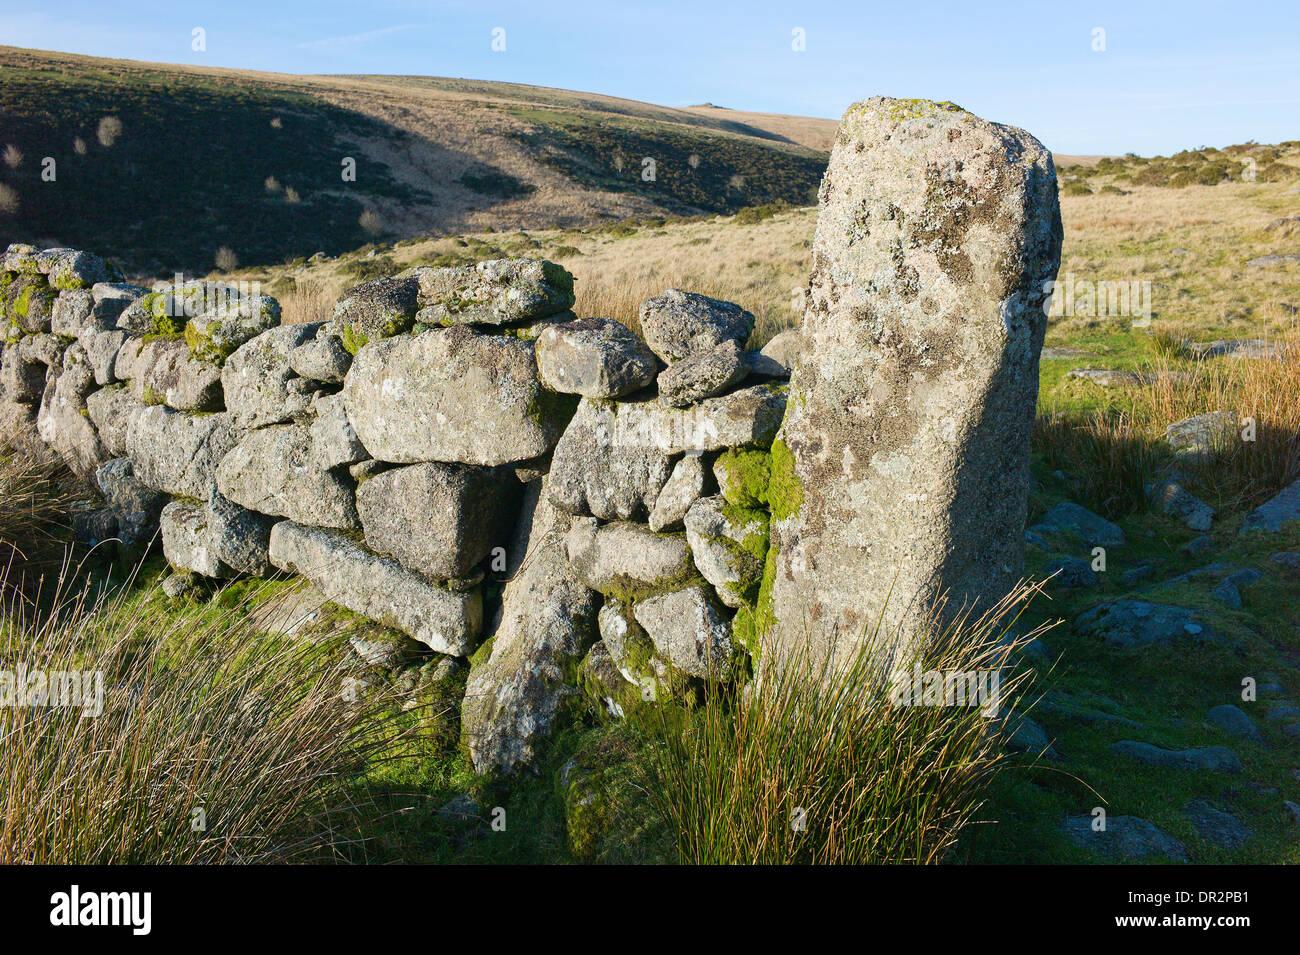 Gateway through a granite drystone wall in West Dart river valley towards Beardown Tors, Dartmoor, Devon - Stock Image